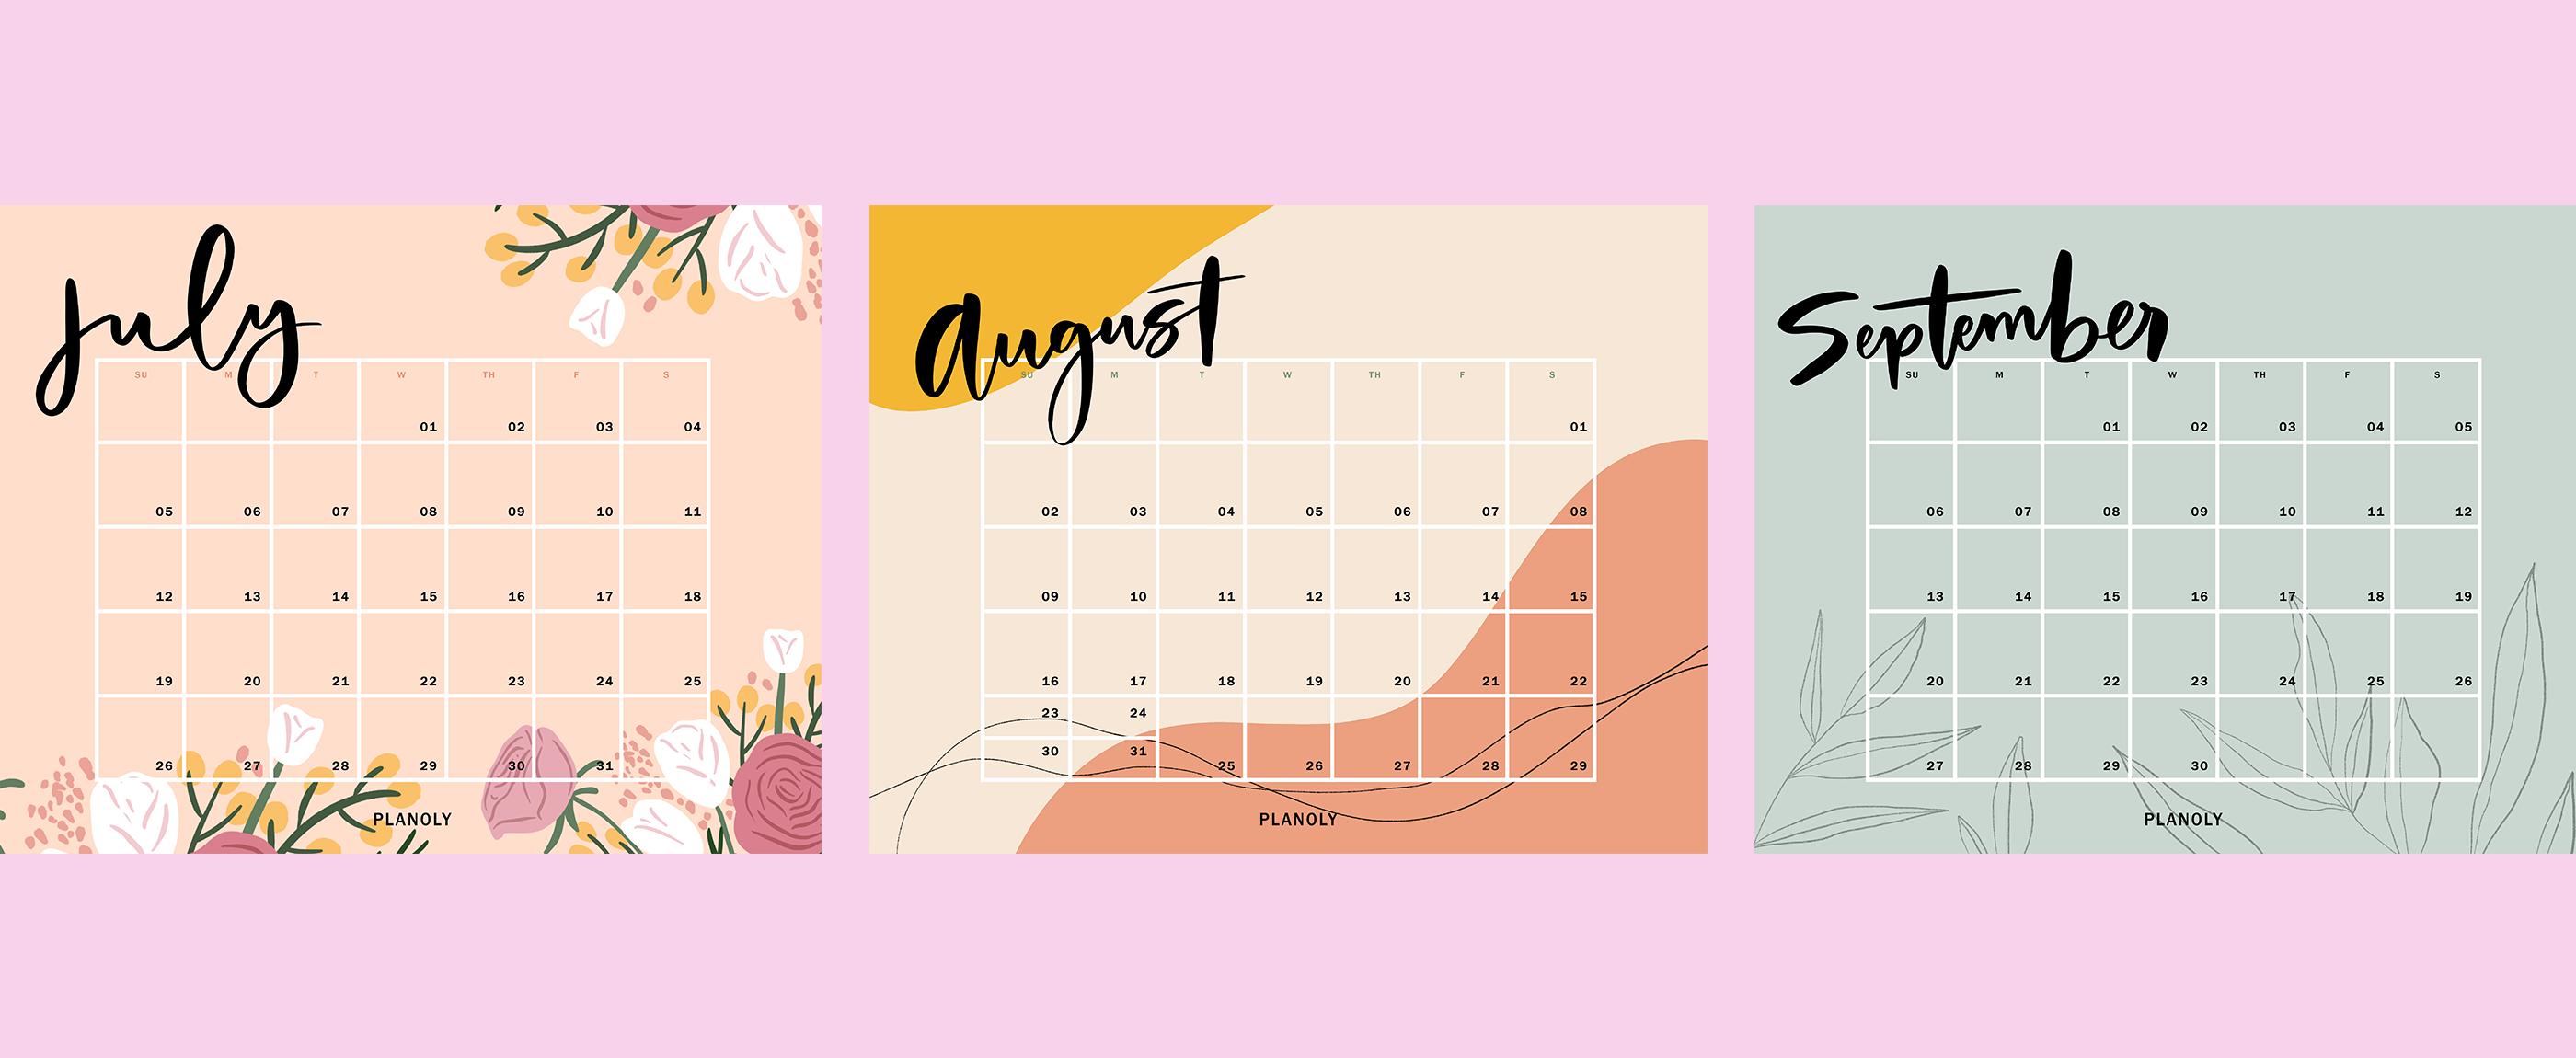 Q3 2020 Content Calendars